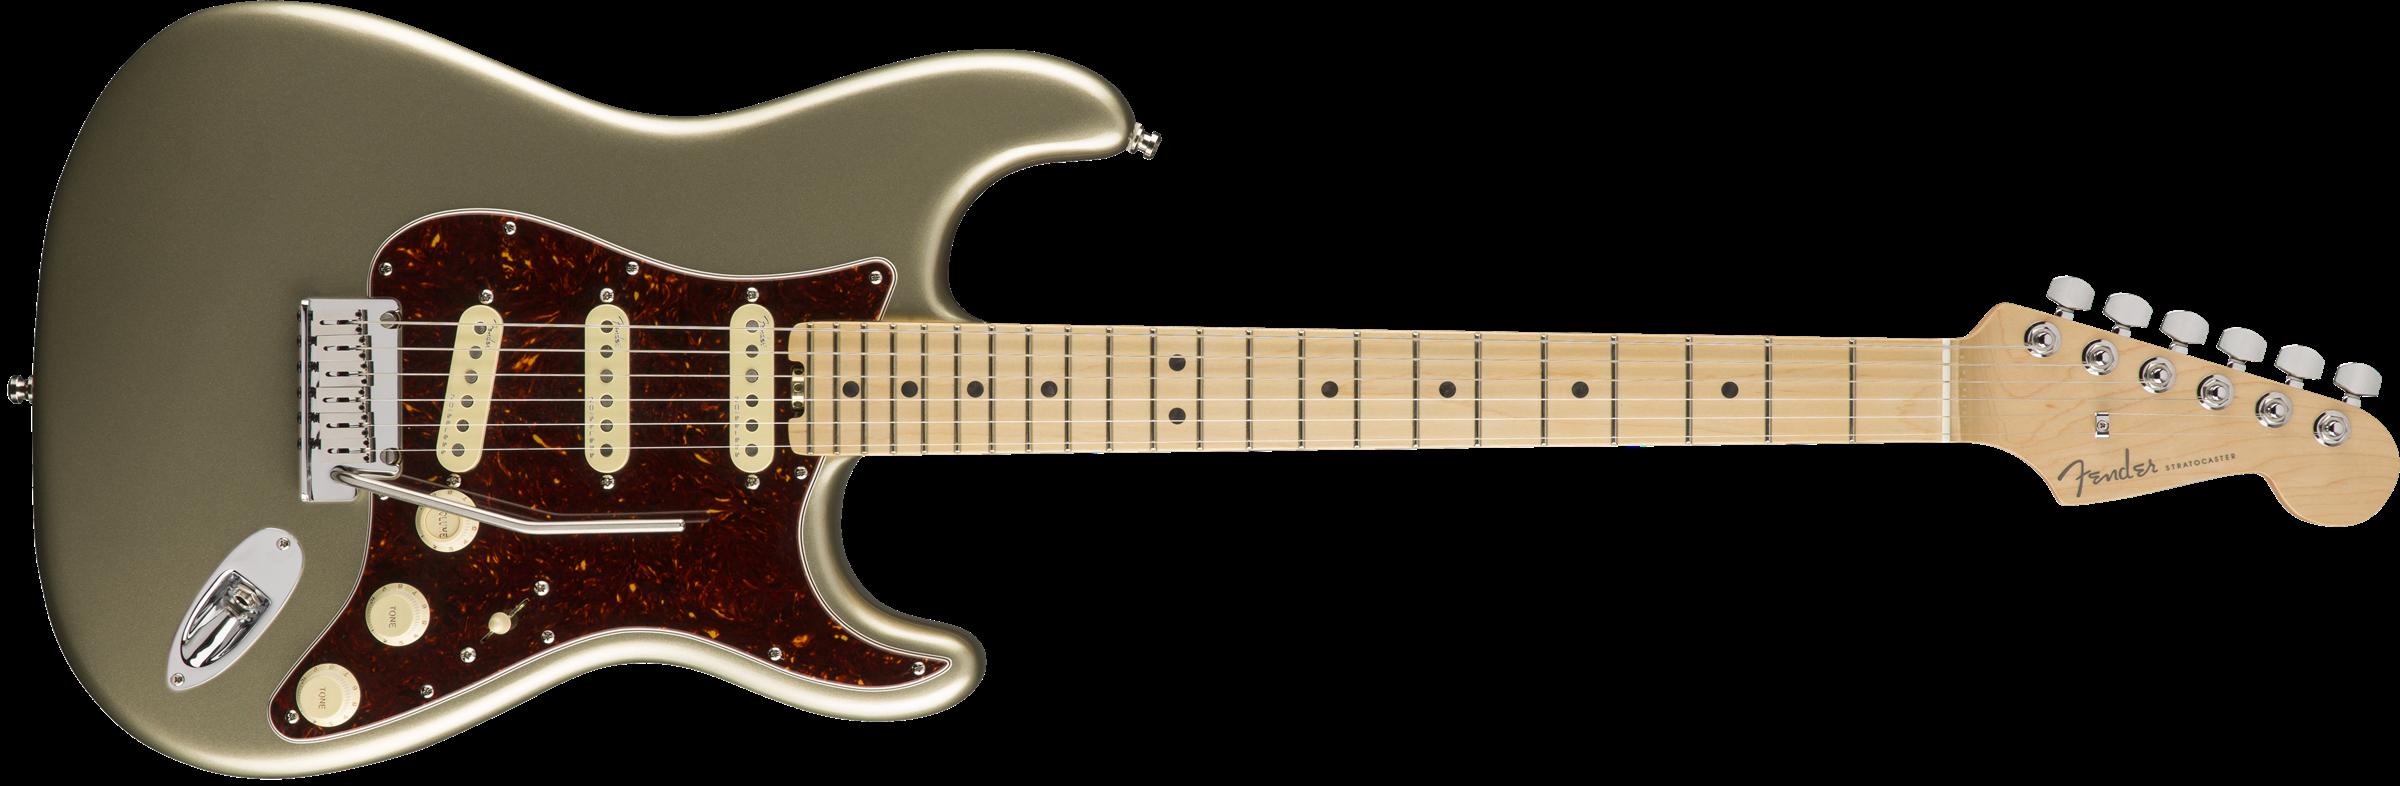 FENDER American Elite Stratocaster, Maple Fingerboard, Champagne